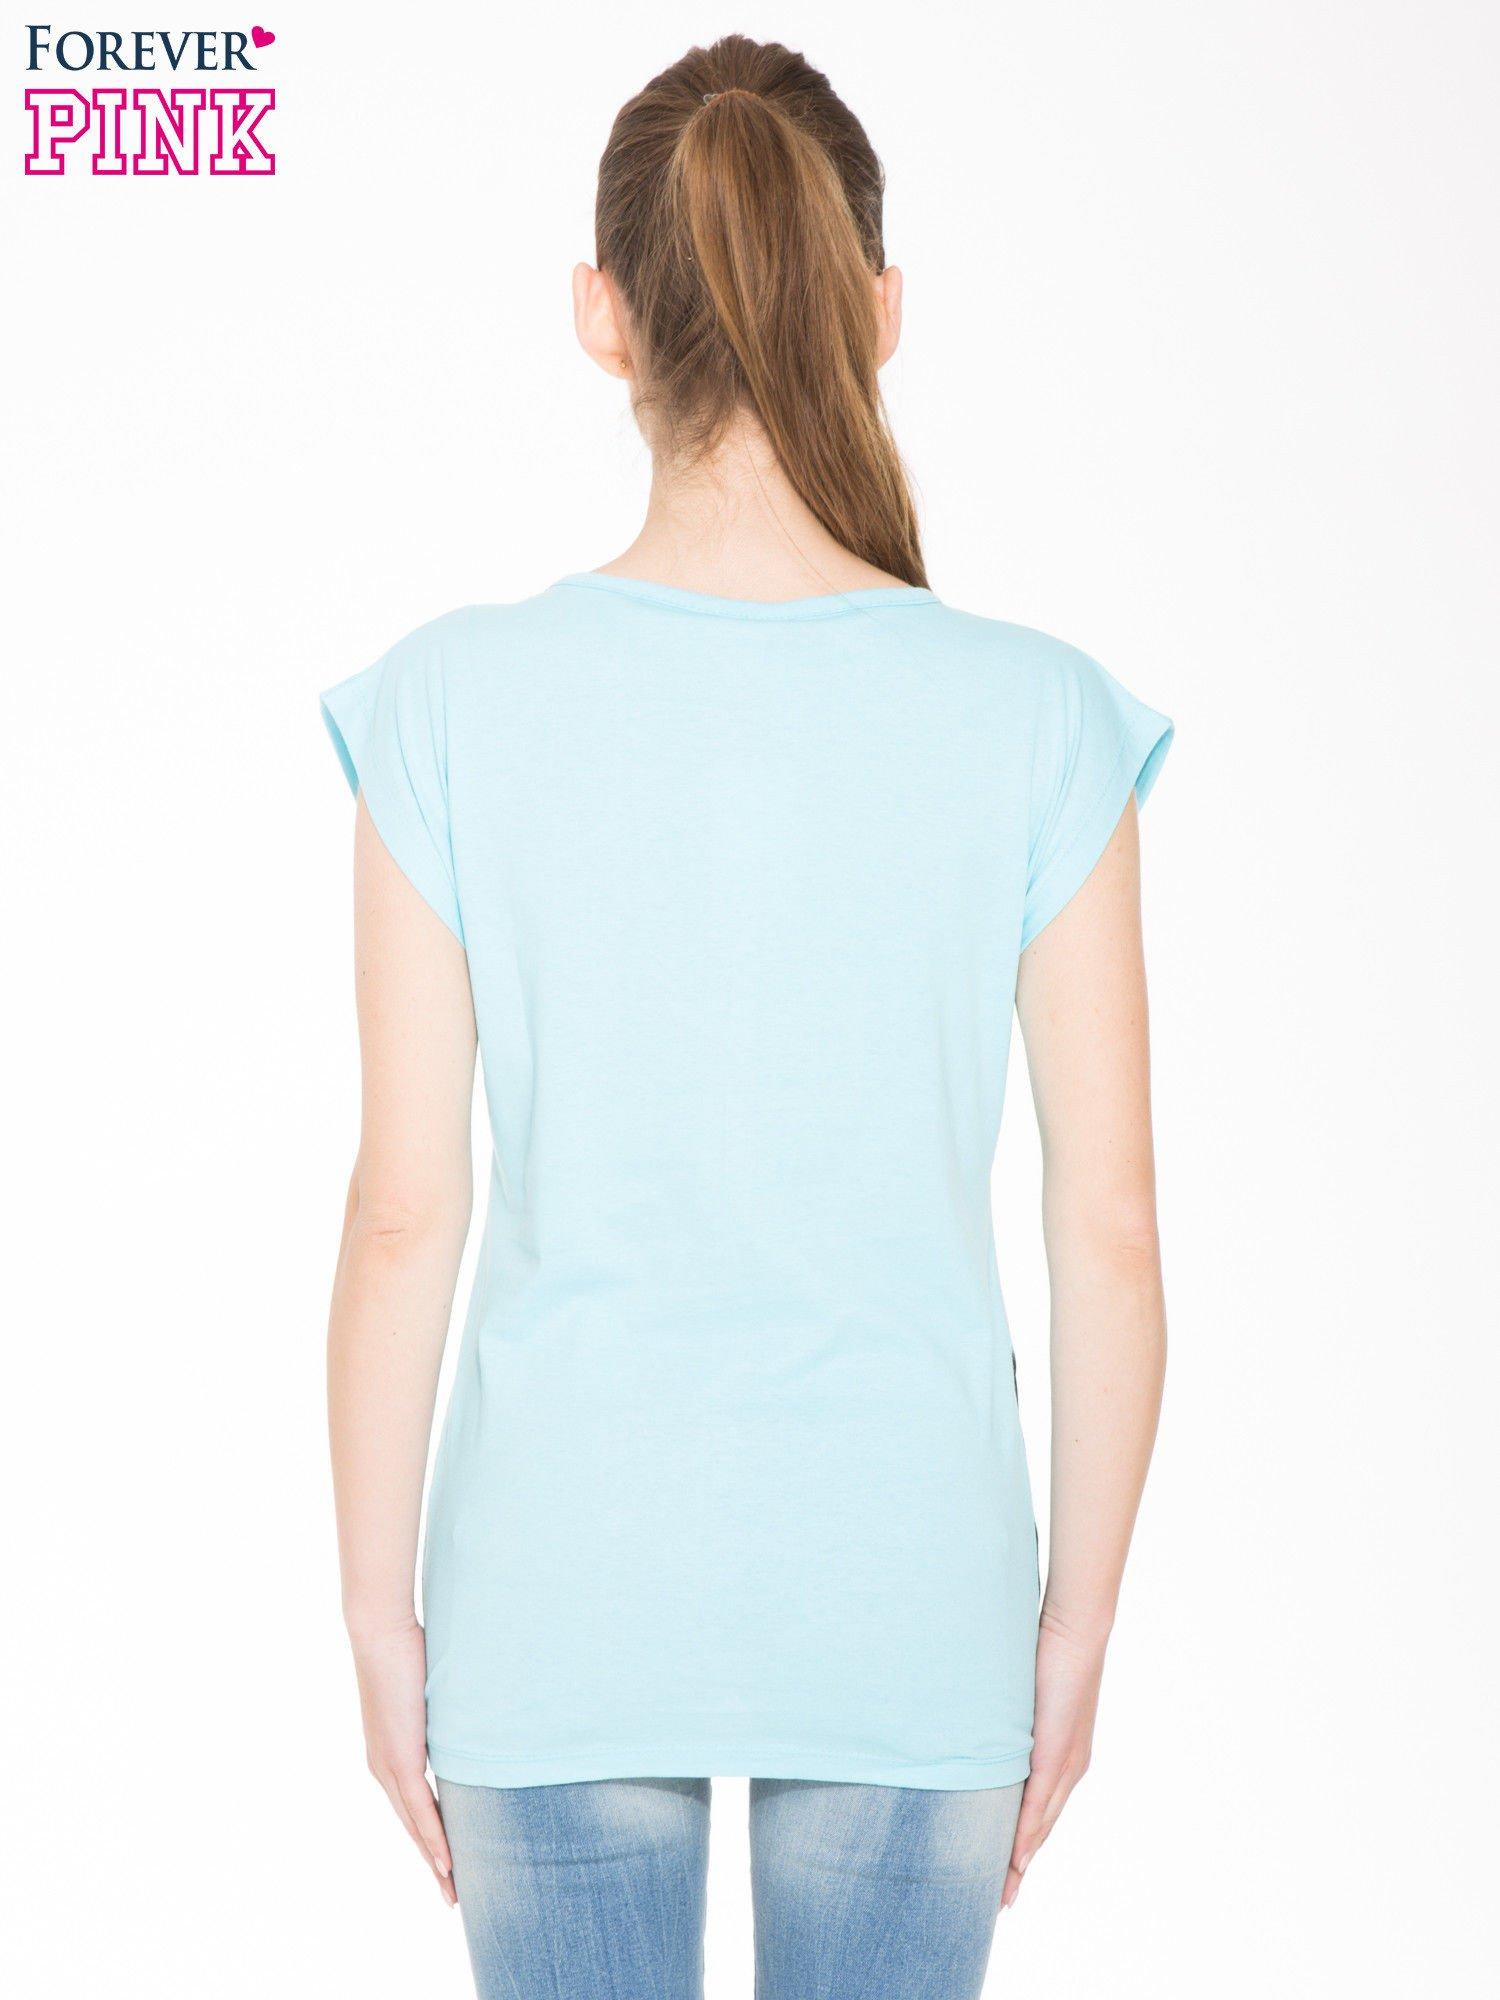 Jasnoniebieski t-shirt z nadrukiem NATURE                                  zdj.                                  3